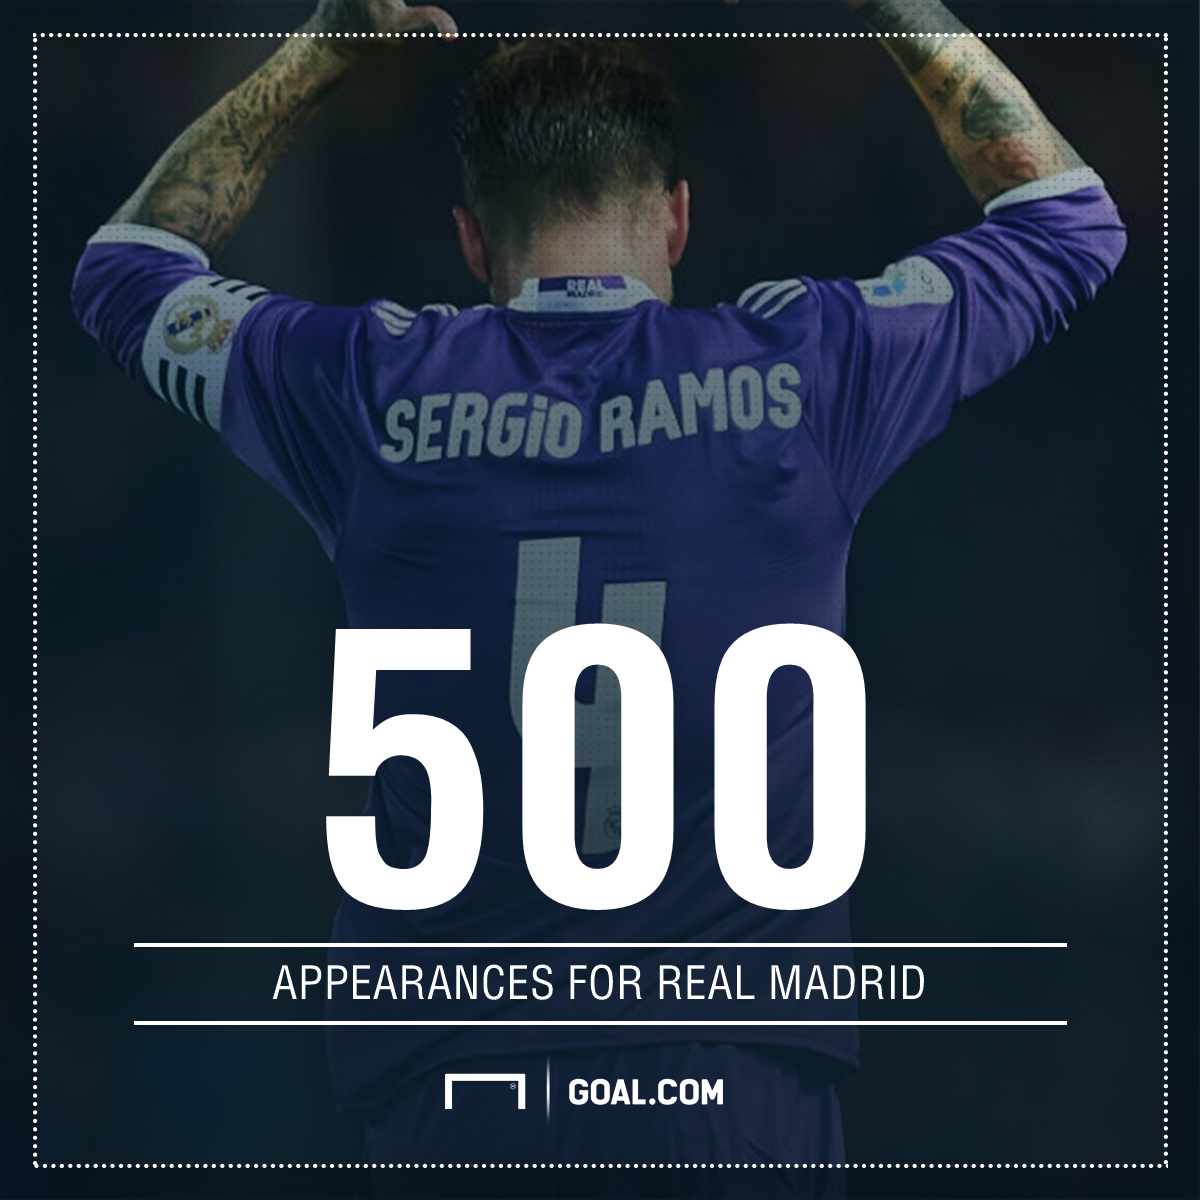 GFX Ramos Madrid appearances